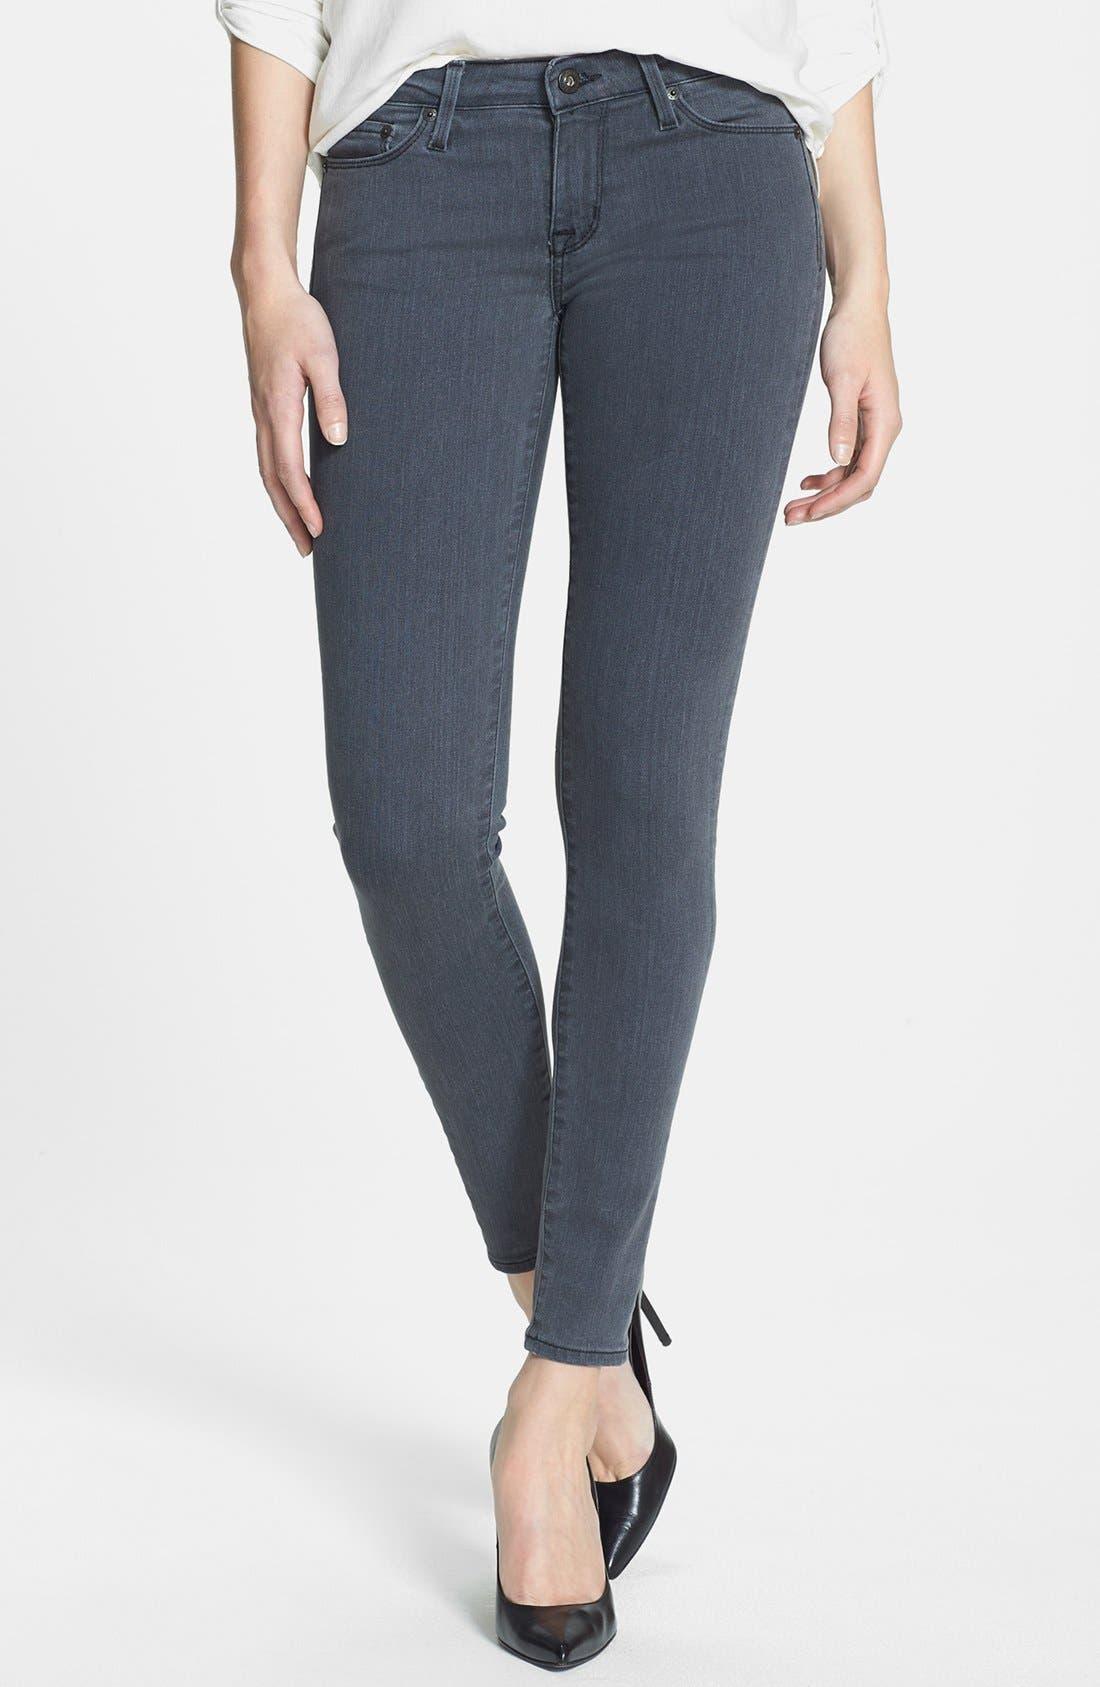 Main Image - Big Star 'Alex' Stretch Skinny Jeans (Liverpool) (Petite)